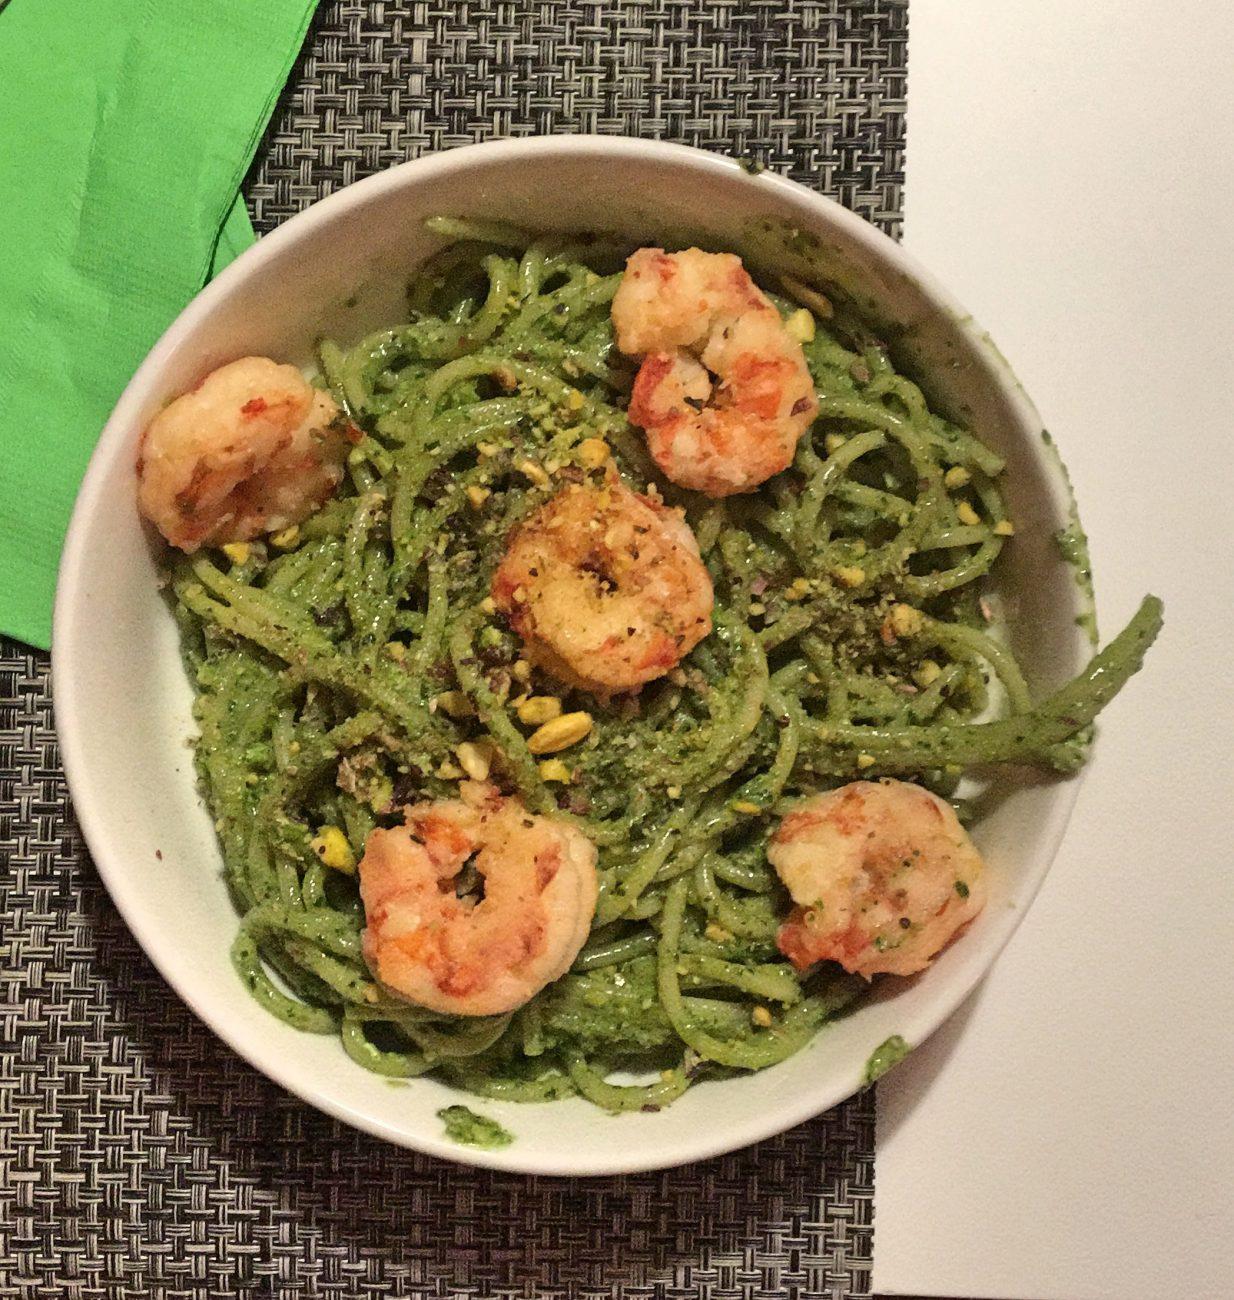 Spaghetti al pesto fresco e gamberi scottati